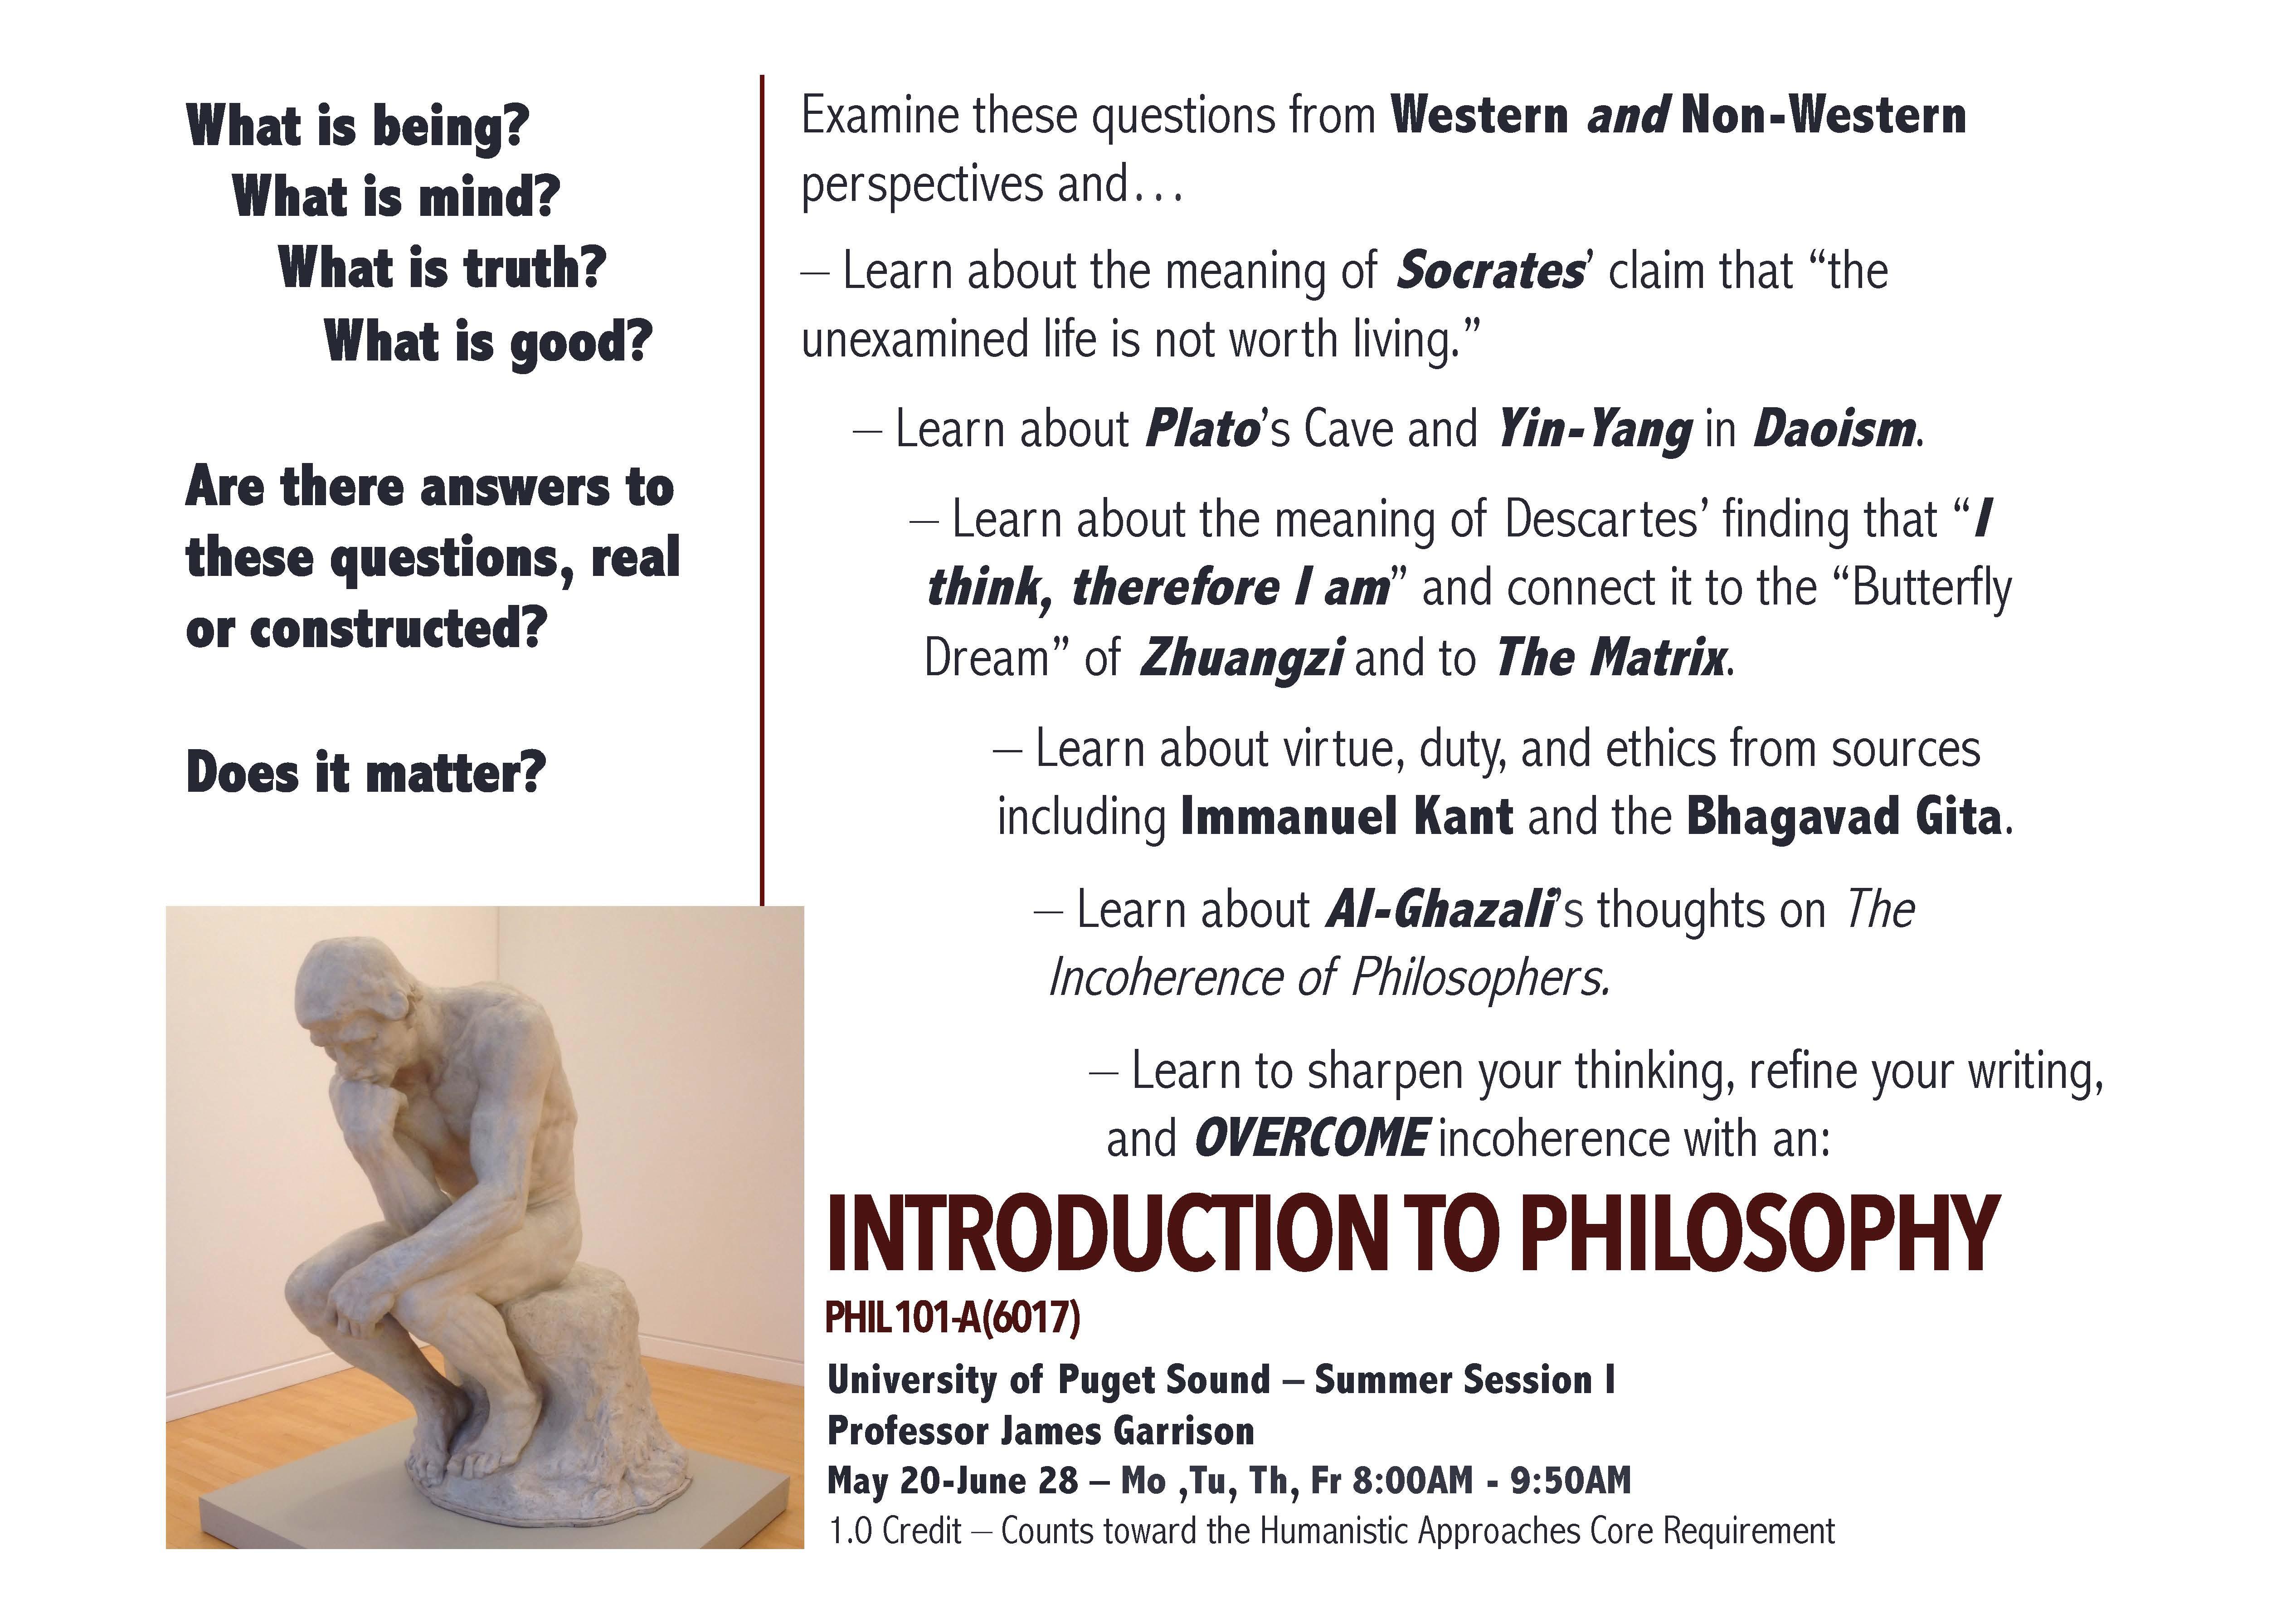 Introduction to Philosophy Flier UPS.jpg